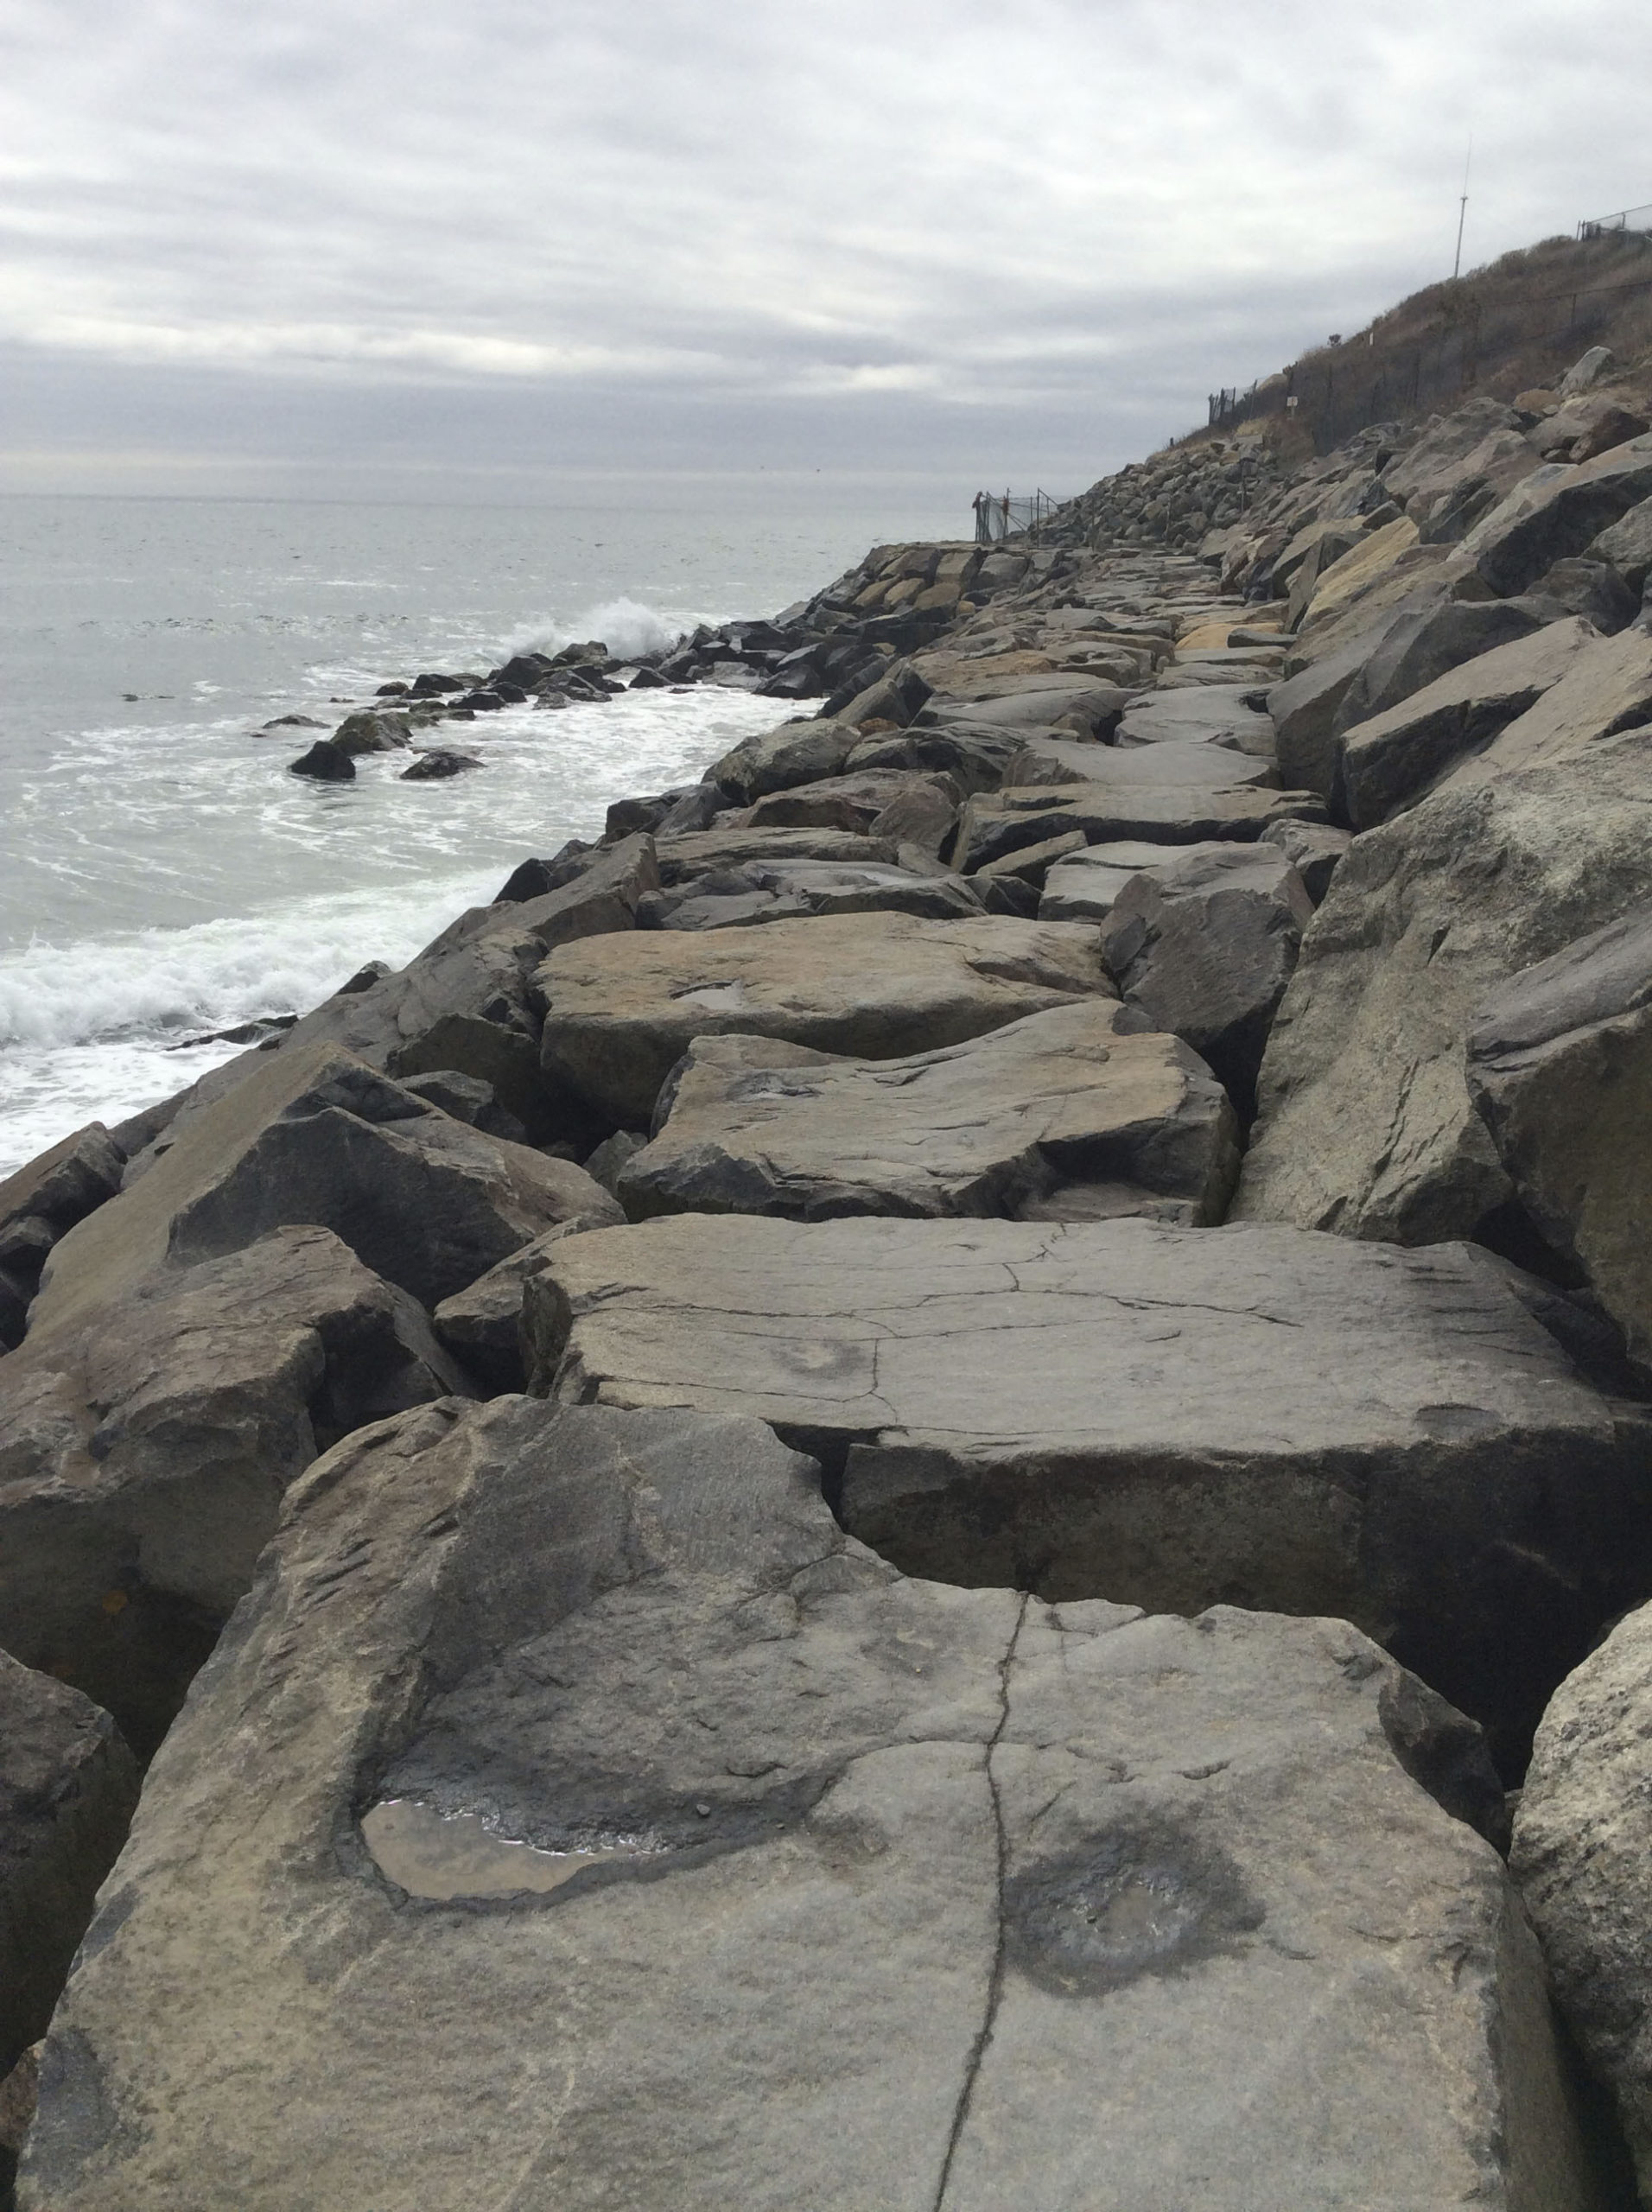 The sea encroaches on the rocks at Montauk Point. BRYAN BOYHAN